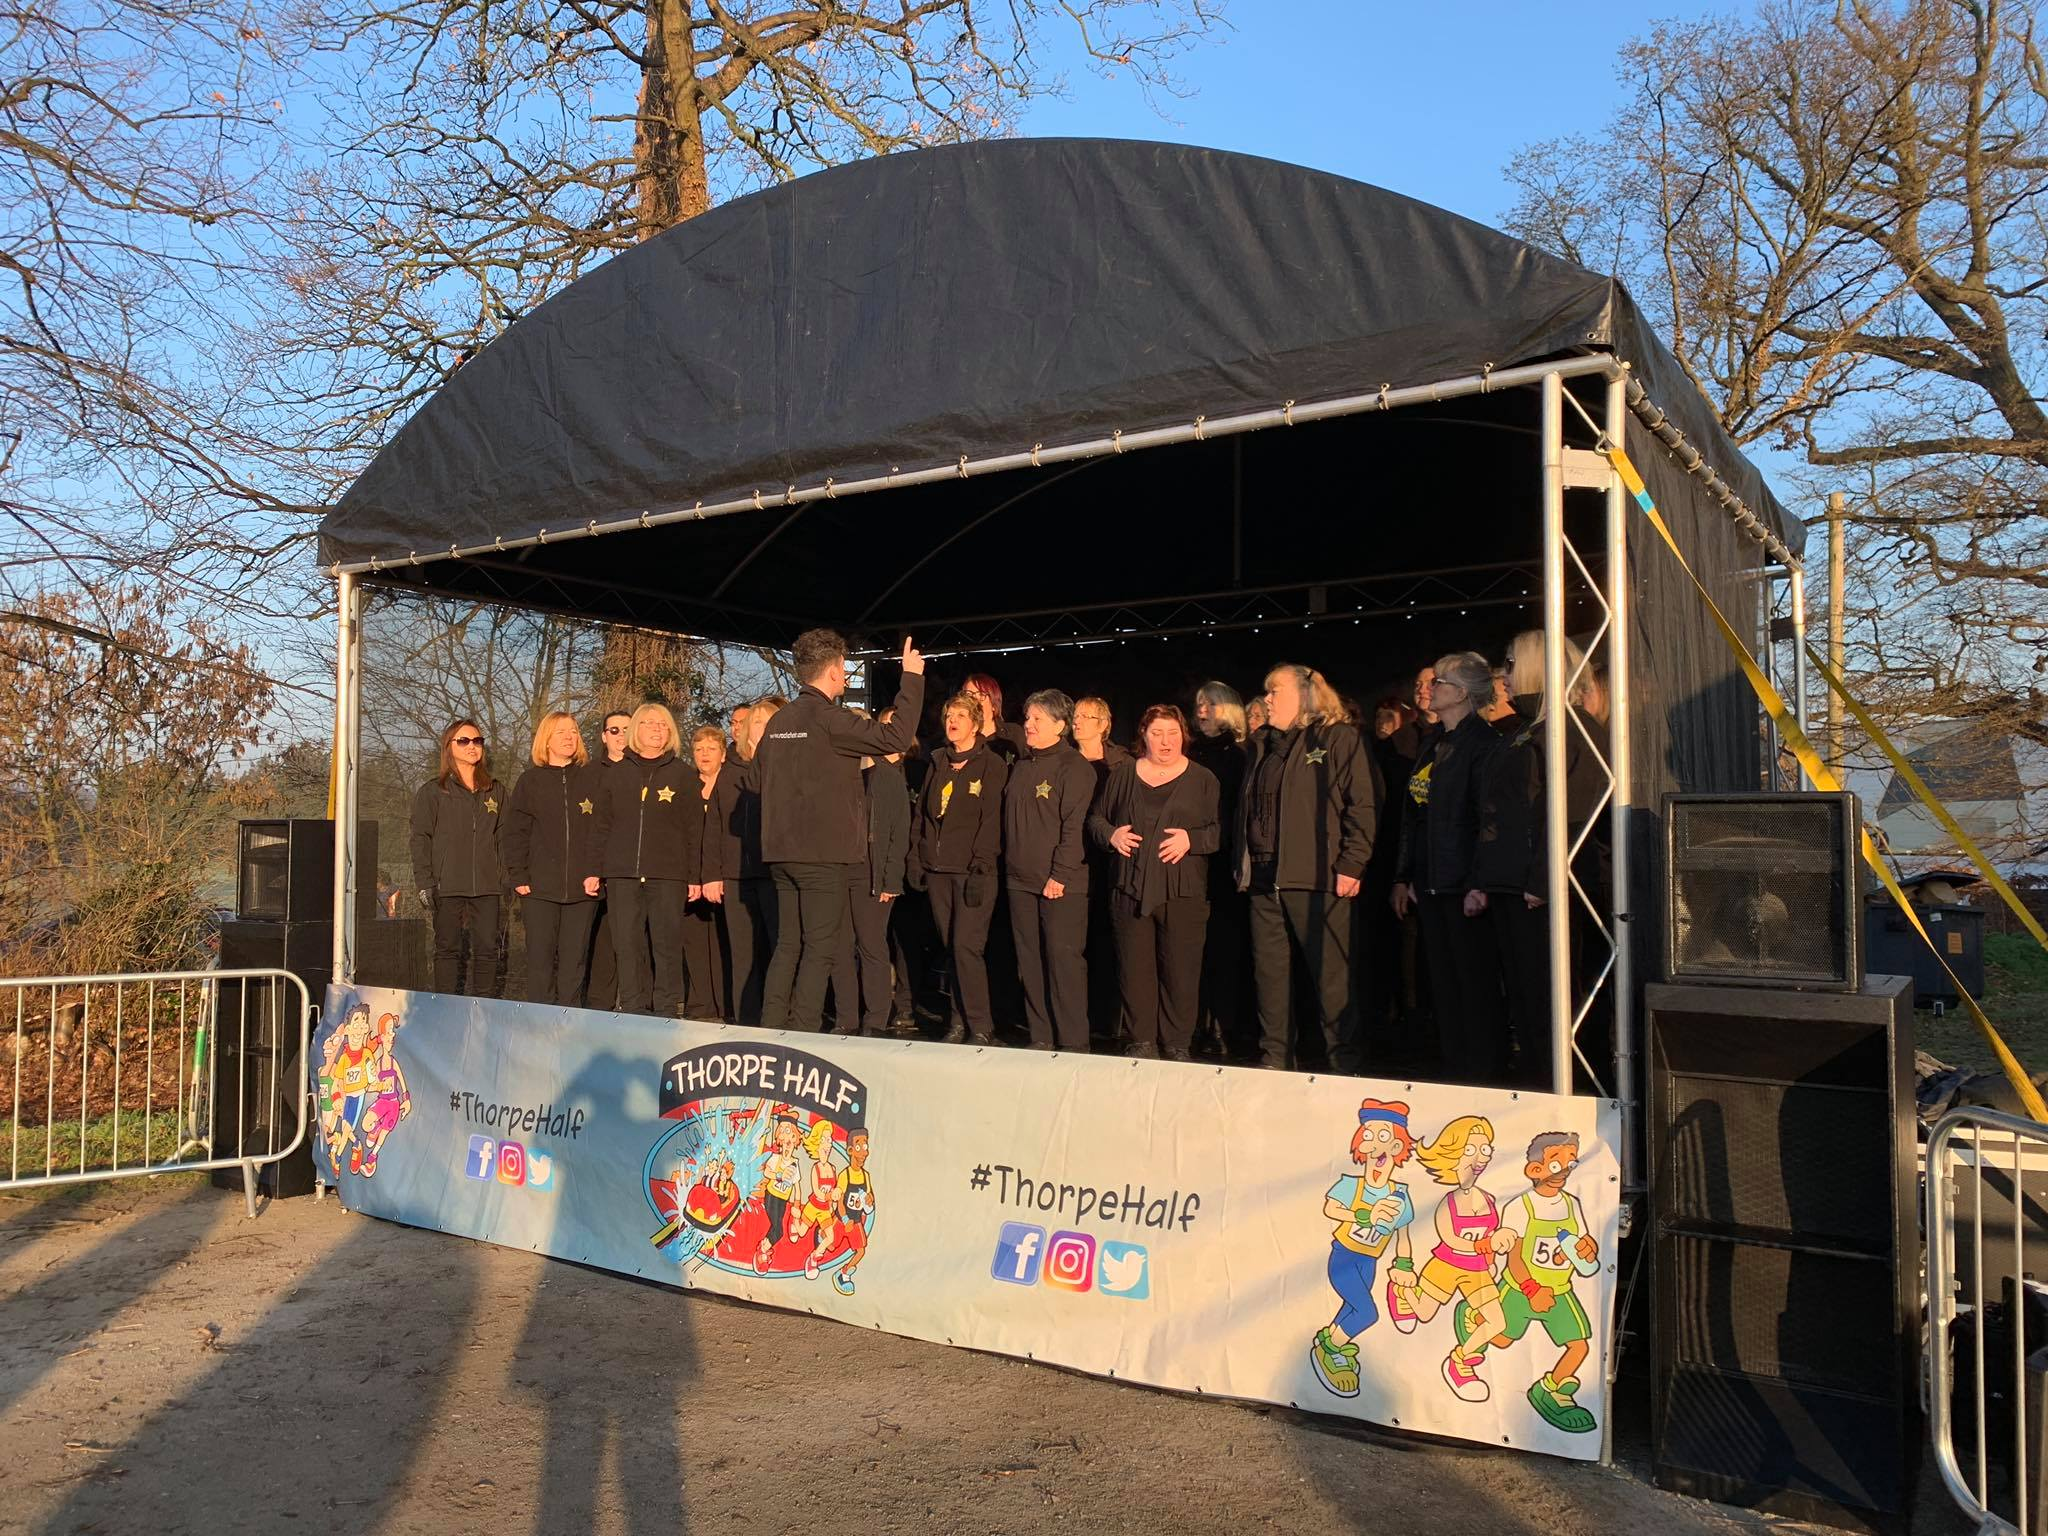 6m x 4m Stage - choir